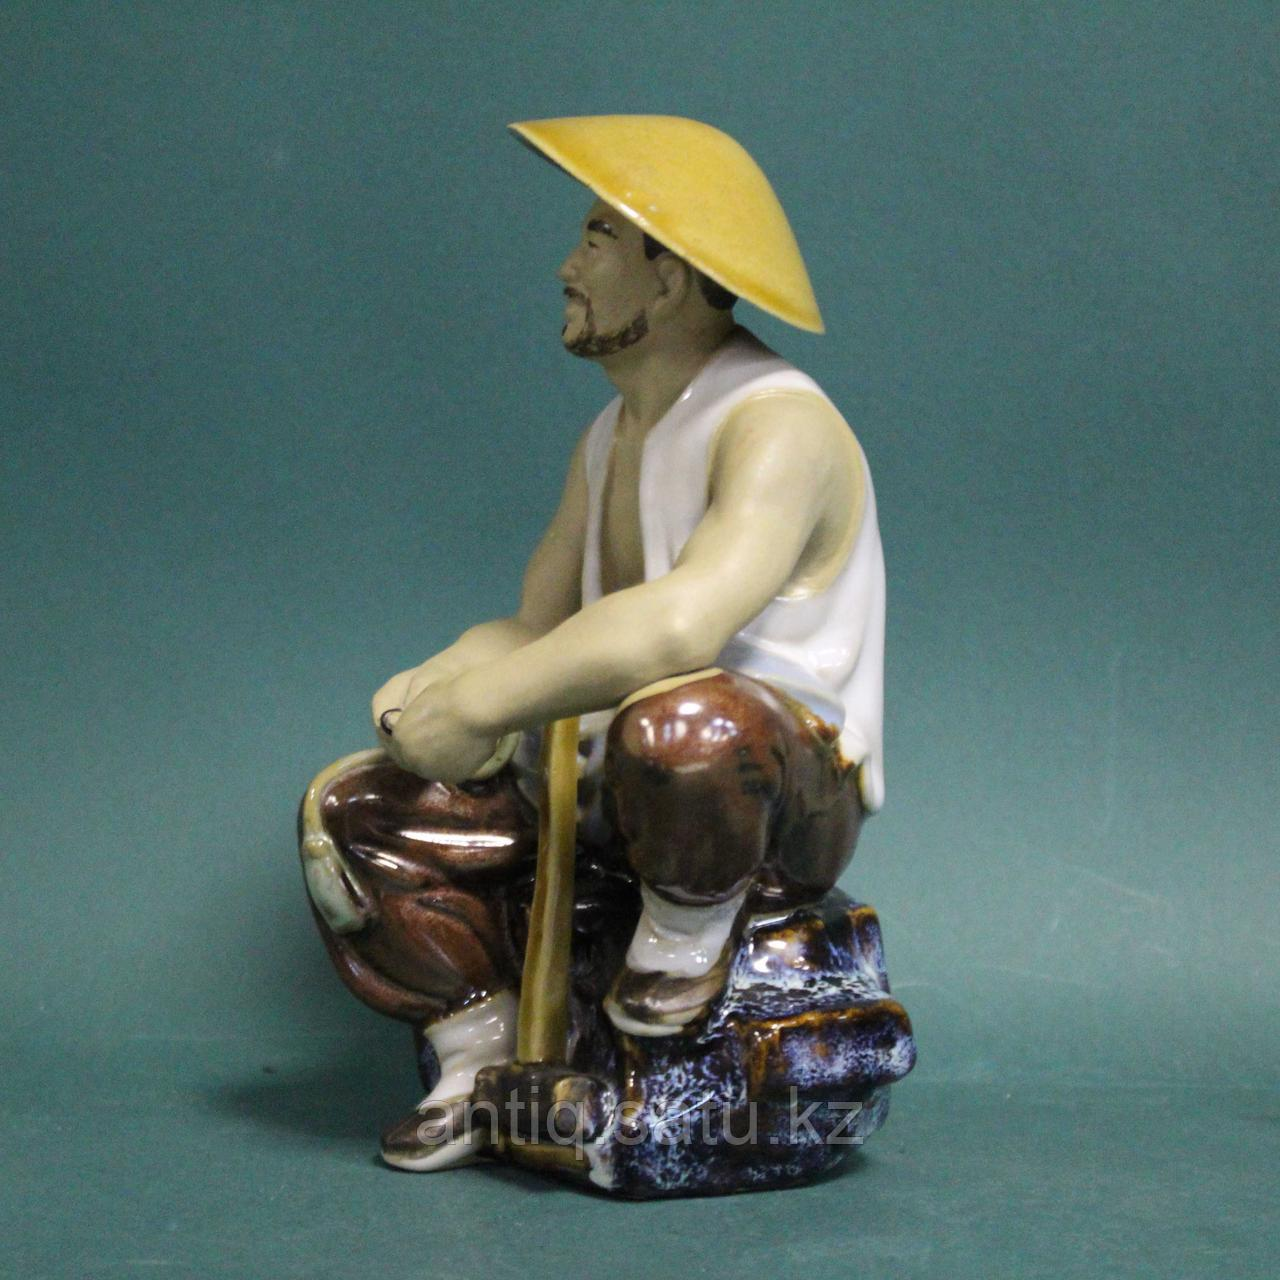 «Ремесленник» Китай. Середина ХХ века - фото 3